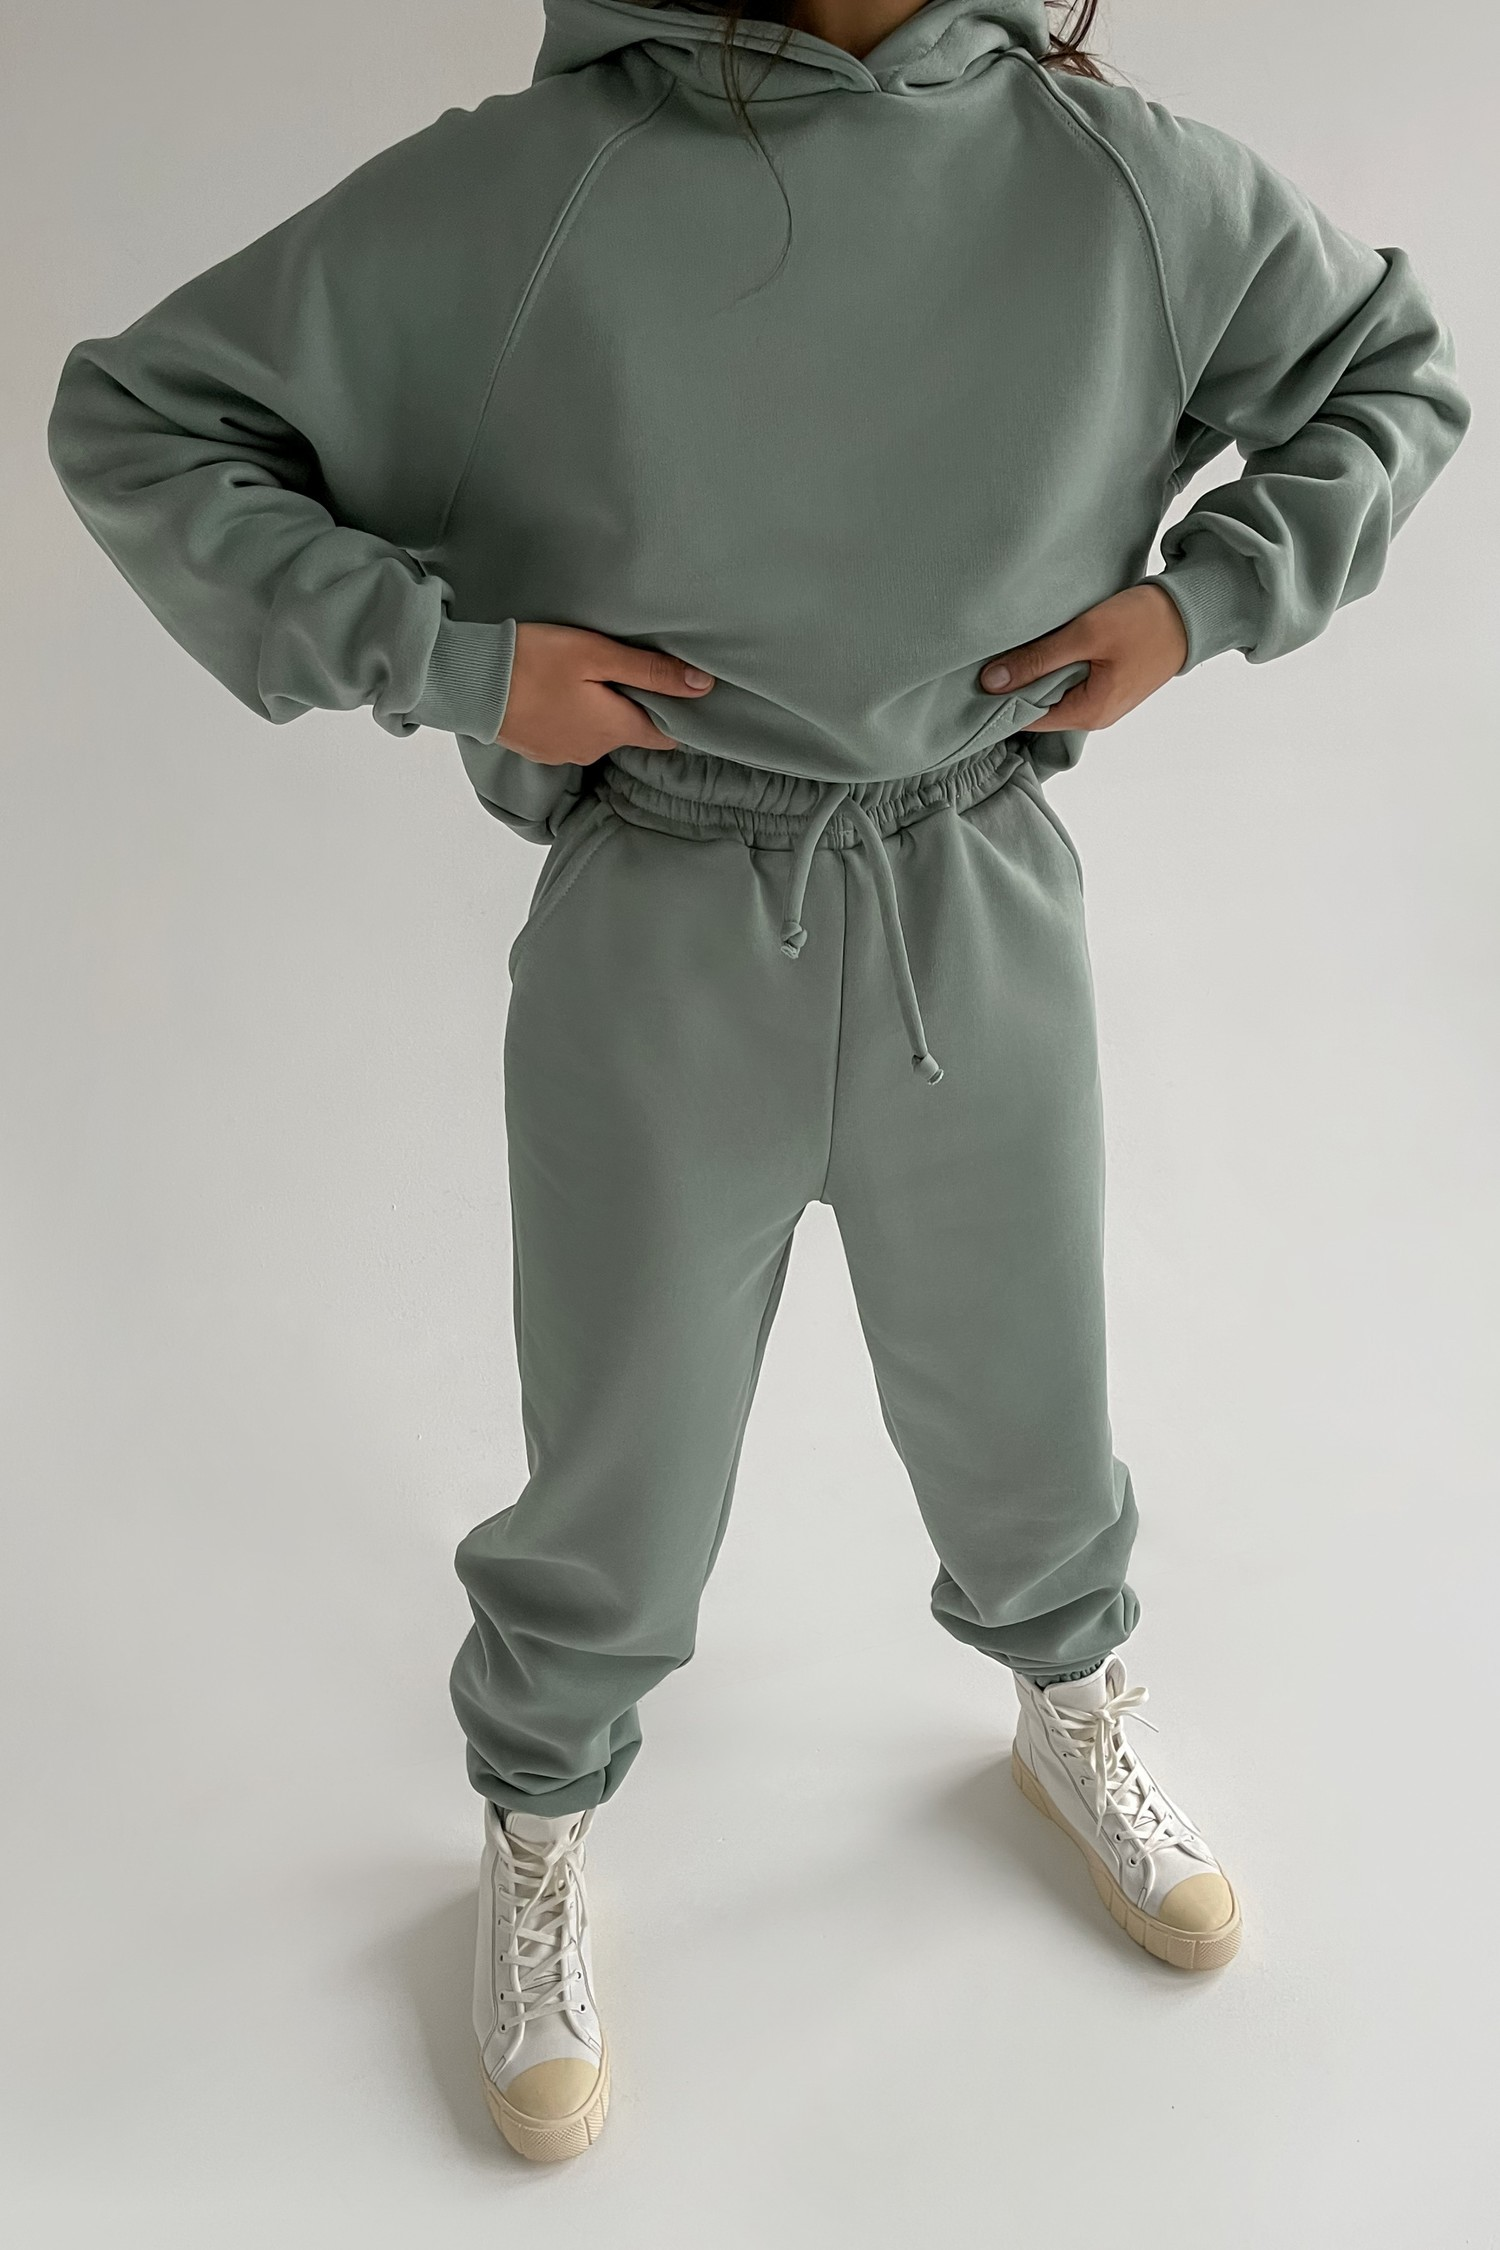 Костюм со спортивными брюками и свитшотом mint - THE LACE